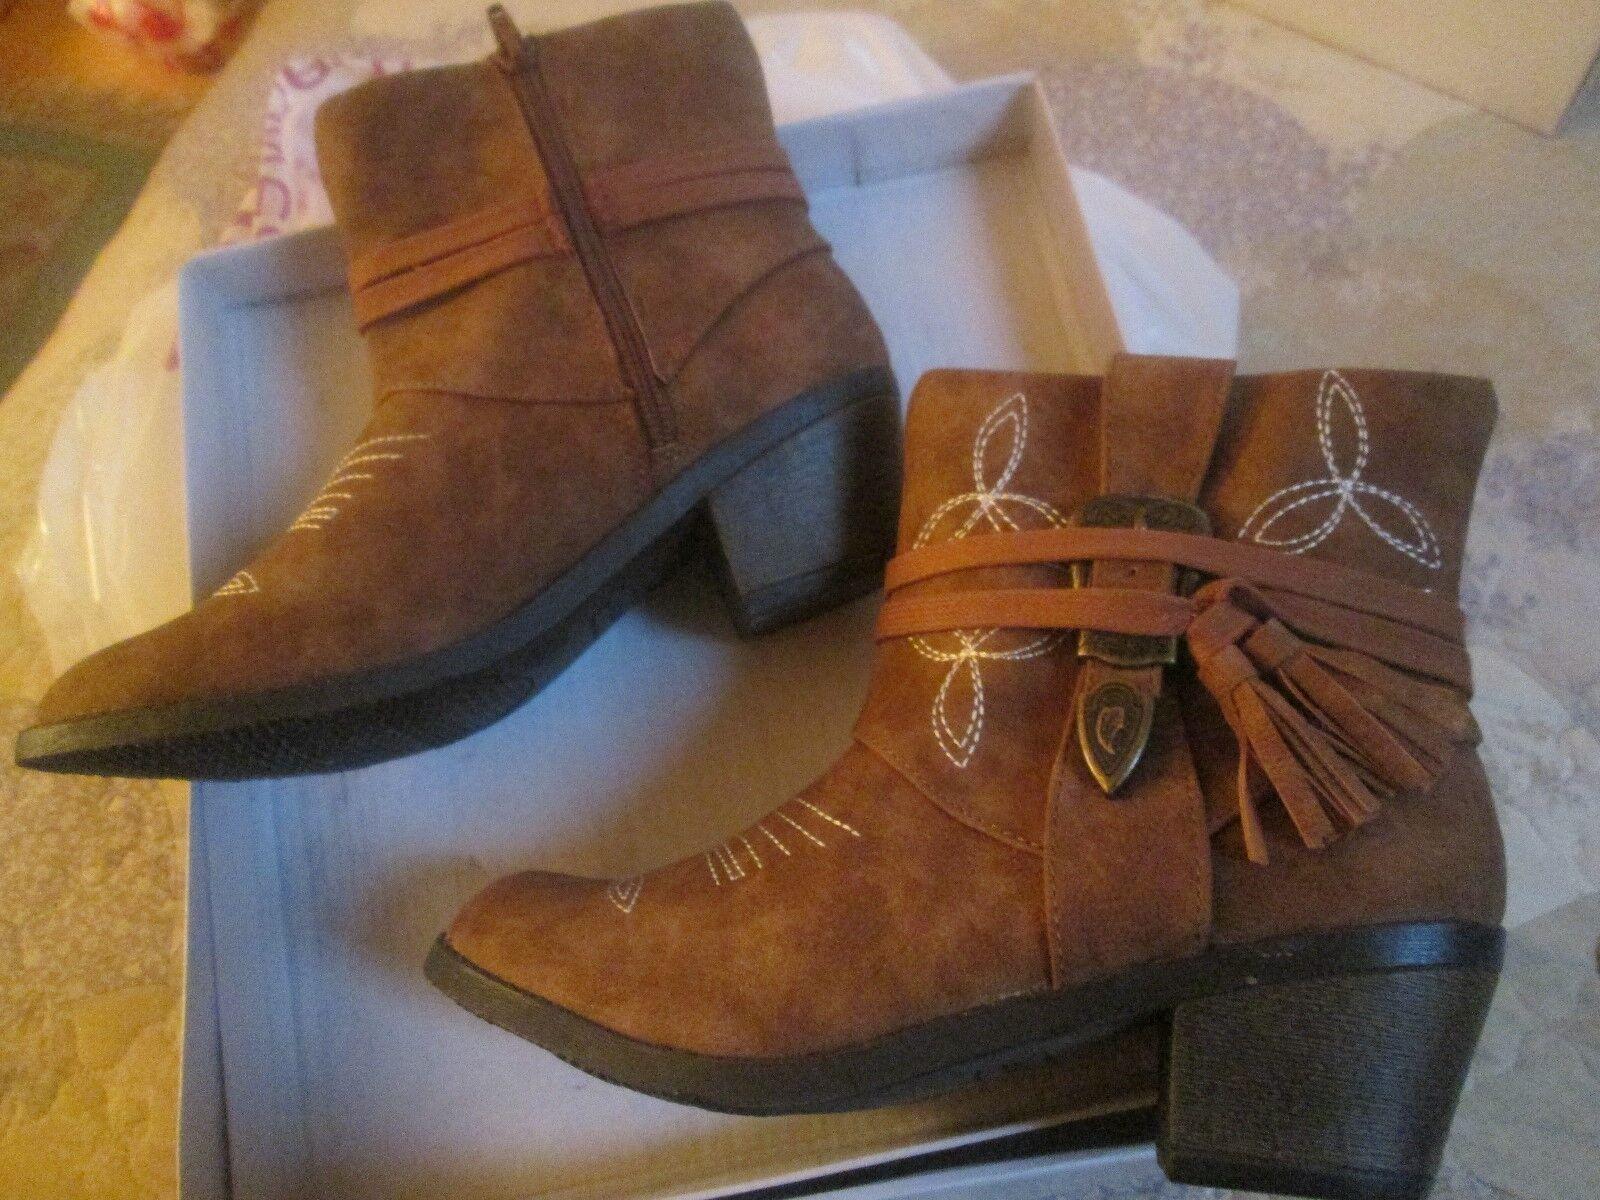 NEW () Steve Madden Cognac Textile Leather w/TASSELS Zip Up Ankle Boots Sz 5